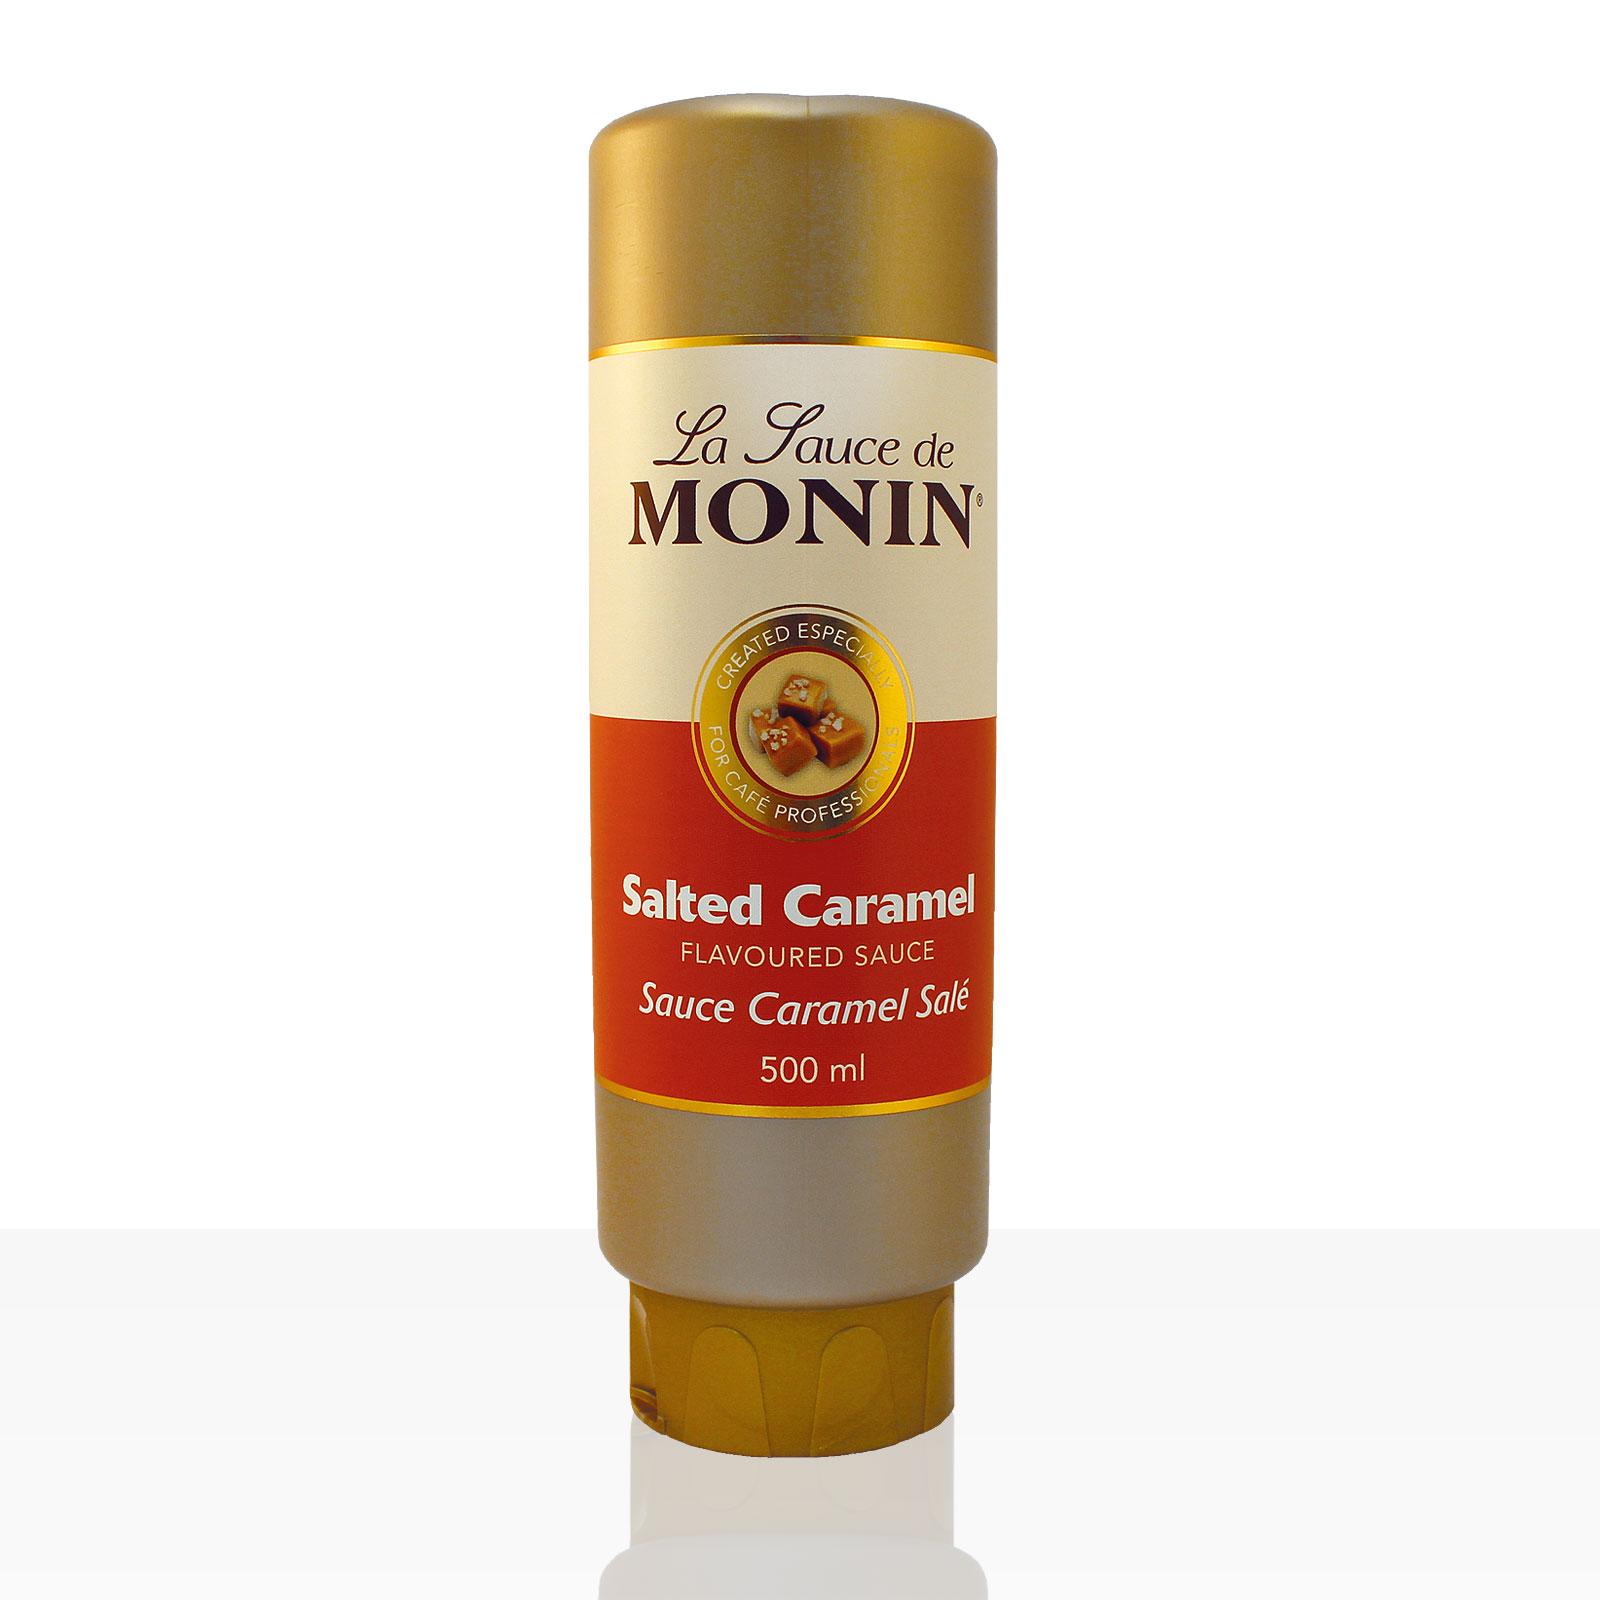 Monin Sauce Salted Caramel 0,5 l, Karamell-Soße